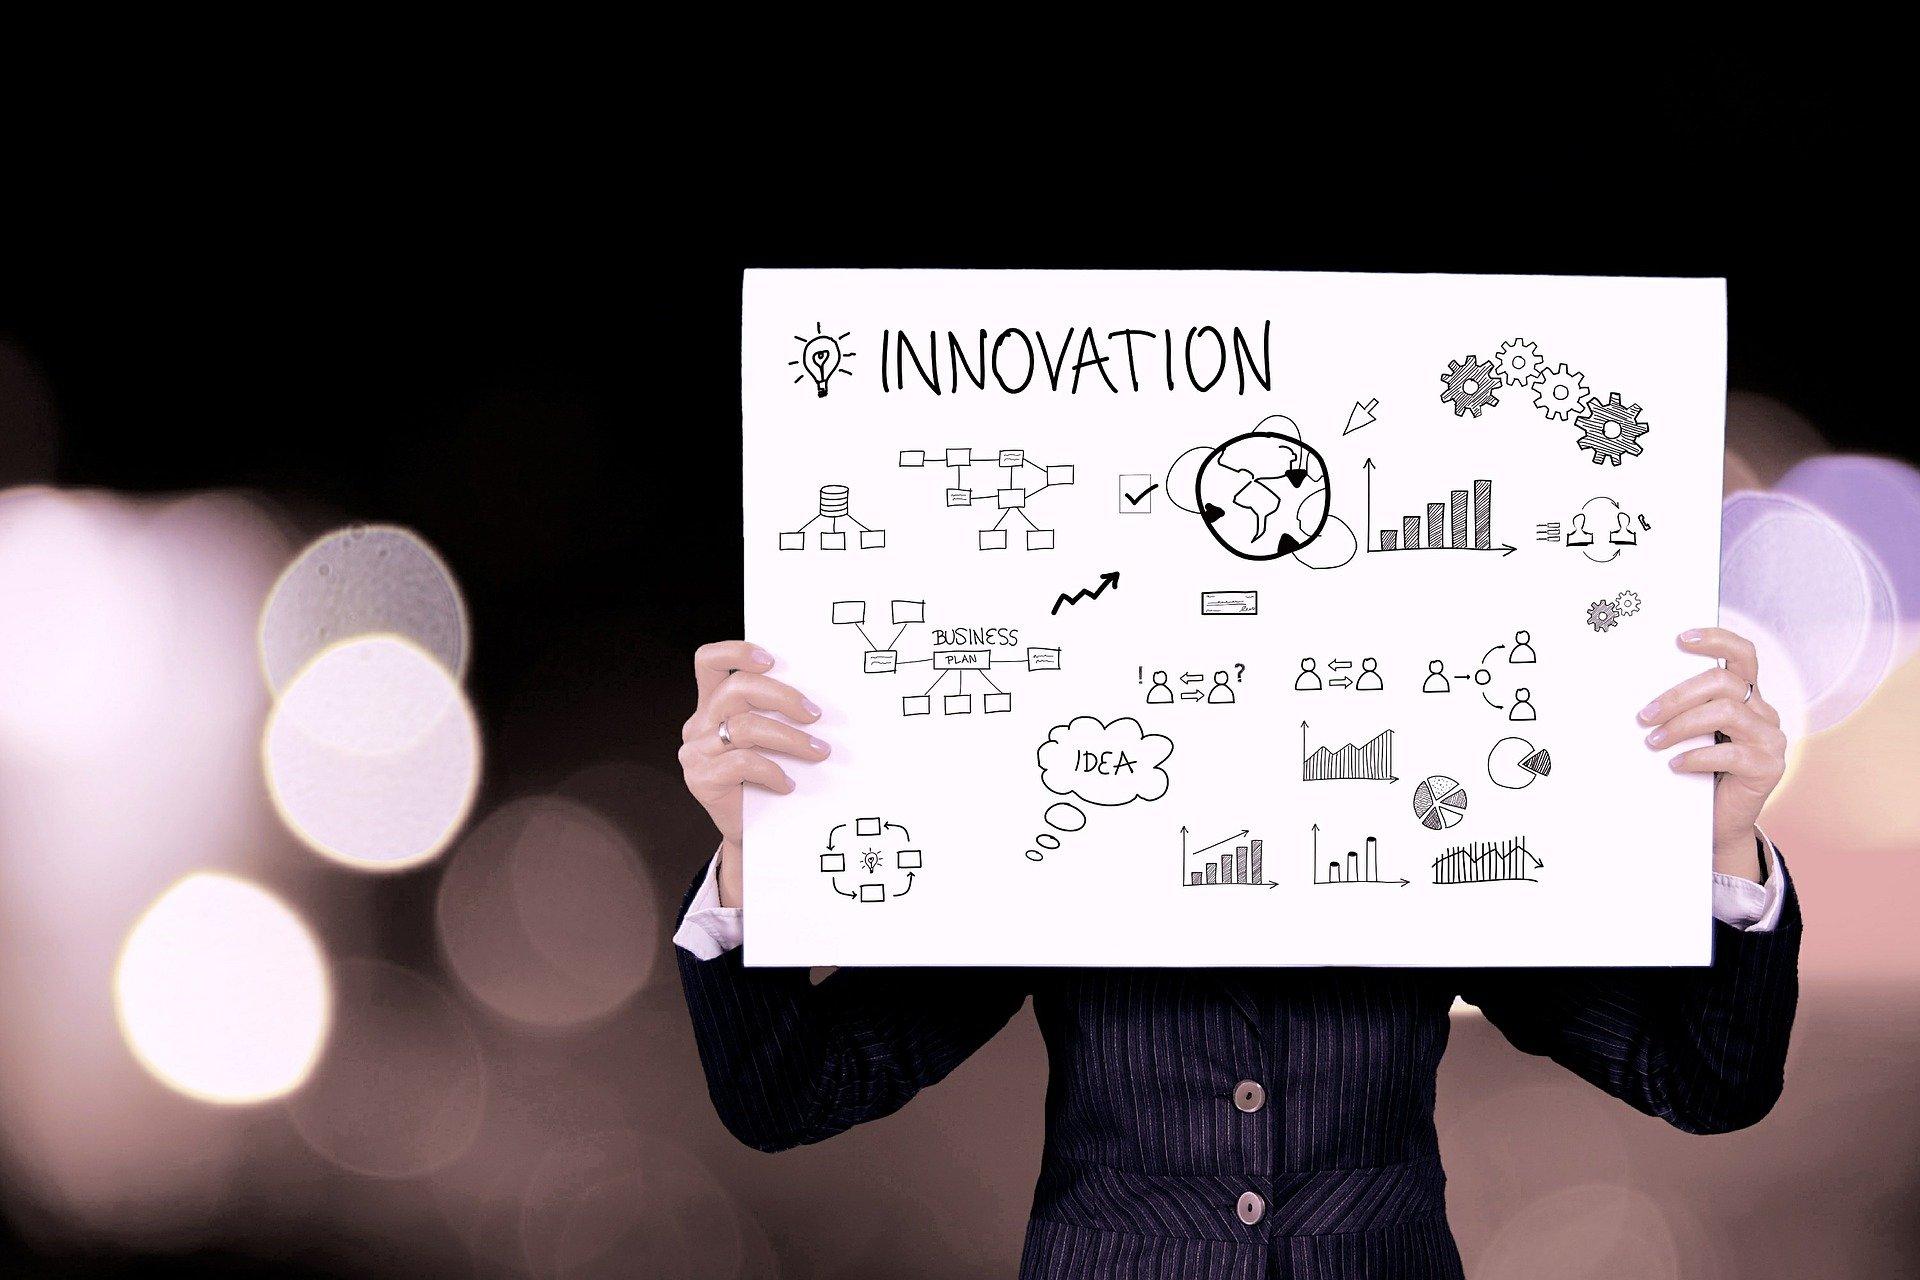 MMIB_Entrepreneurship and Innovation